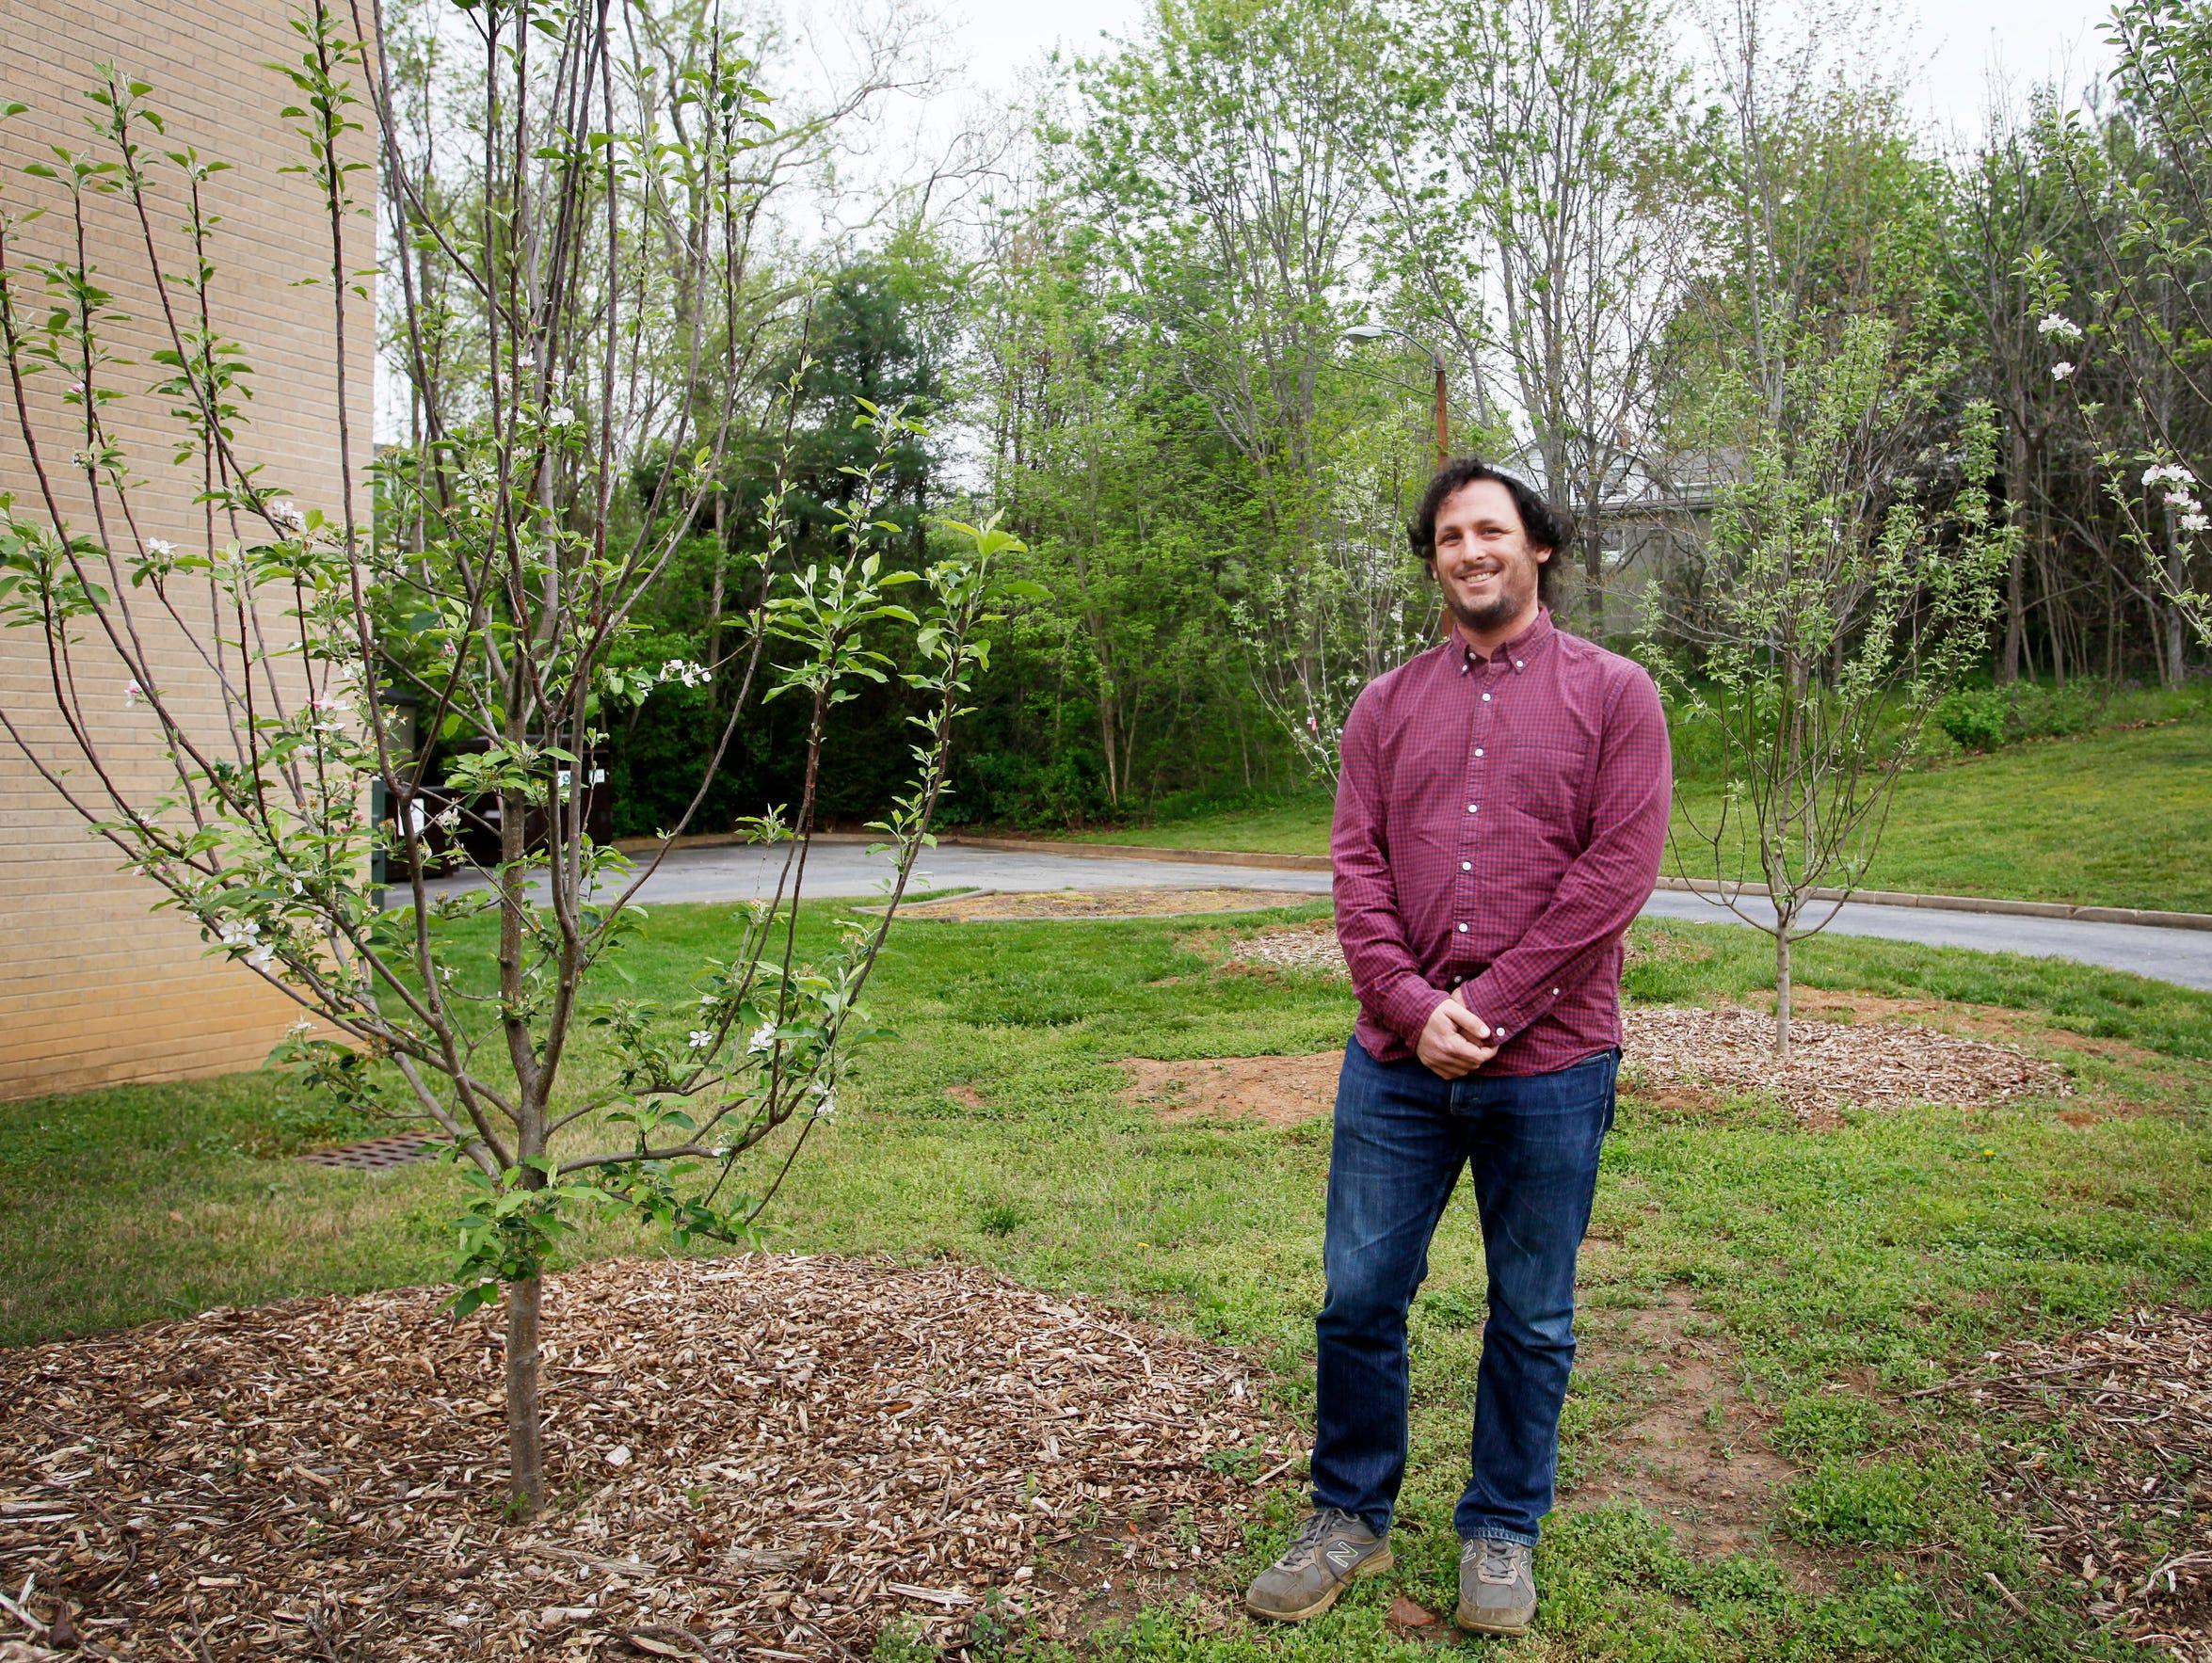 Rabbi Justin Goldstein stands among Congregation Beth